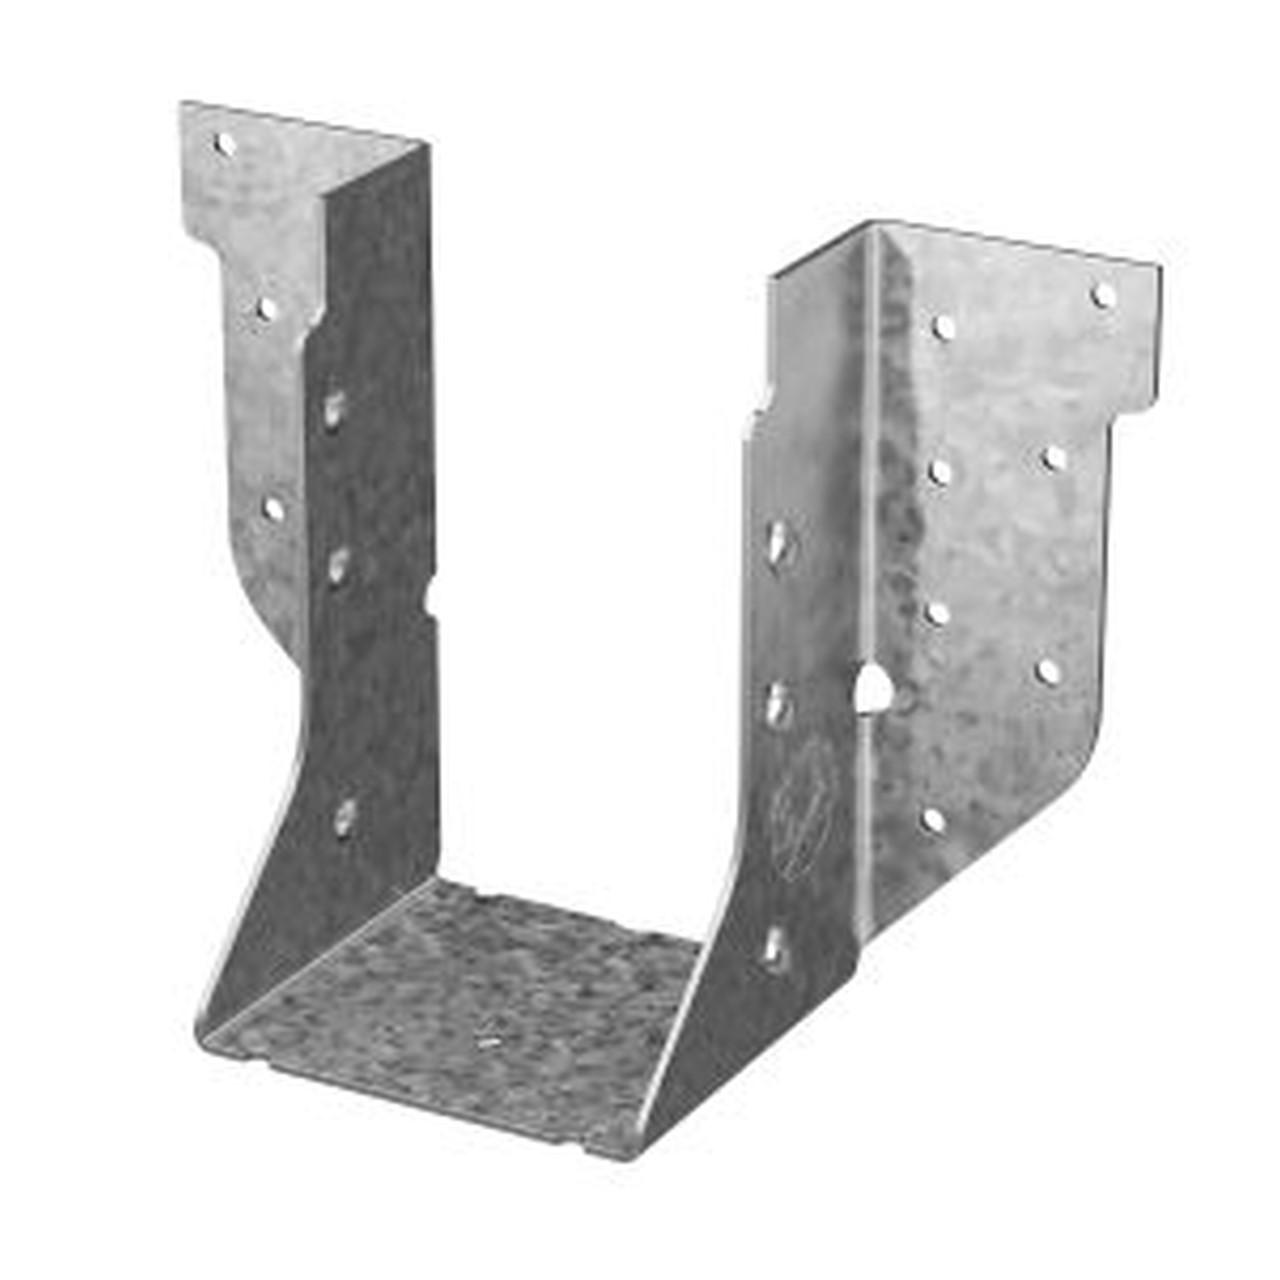 Simpson Strong-Tie HHUS46 Face Mount Hanger